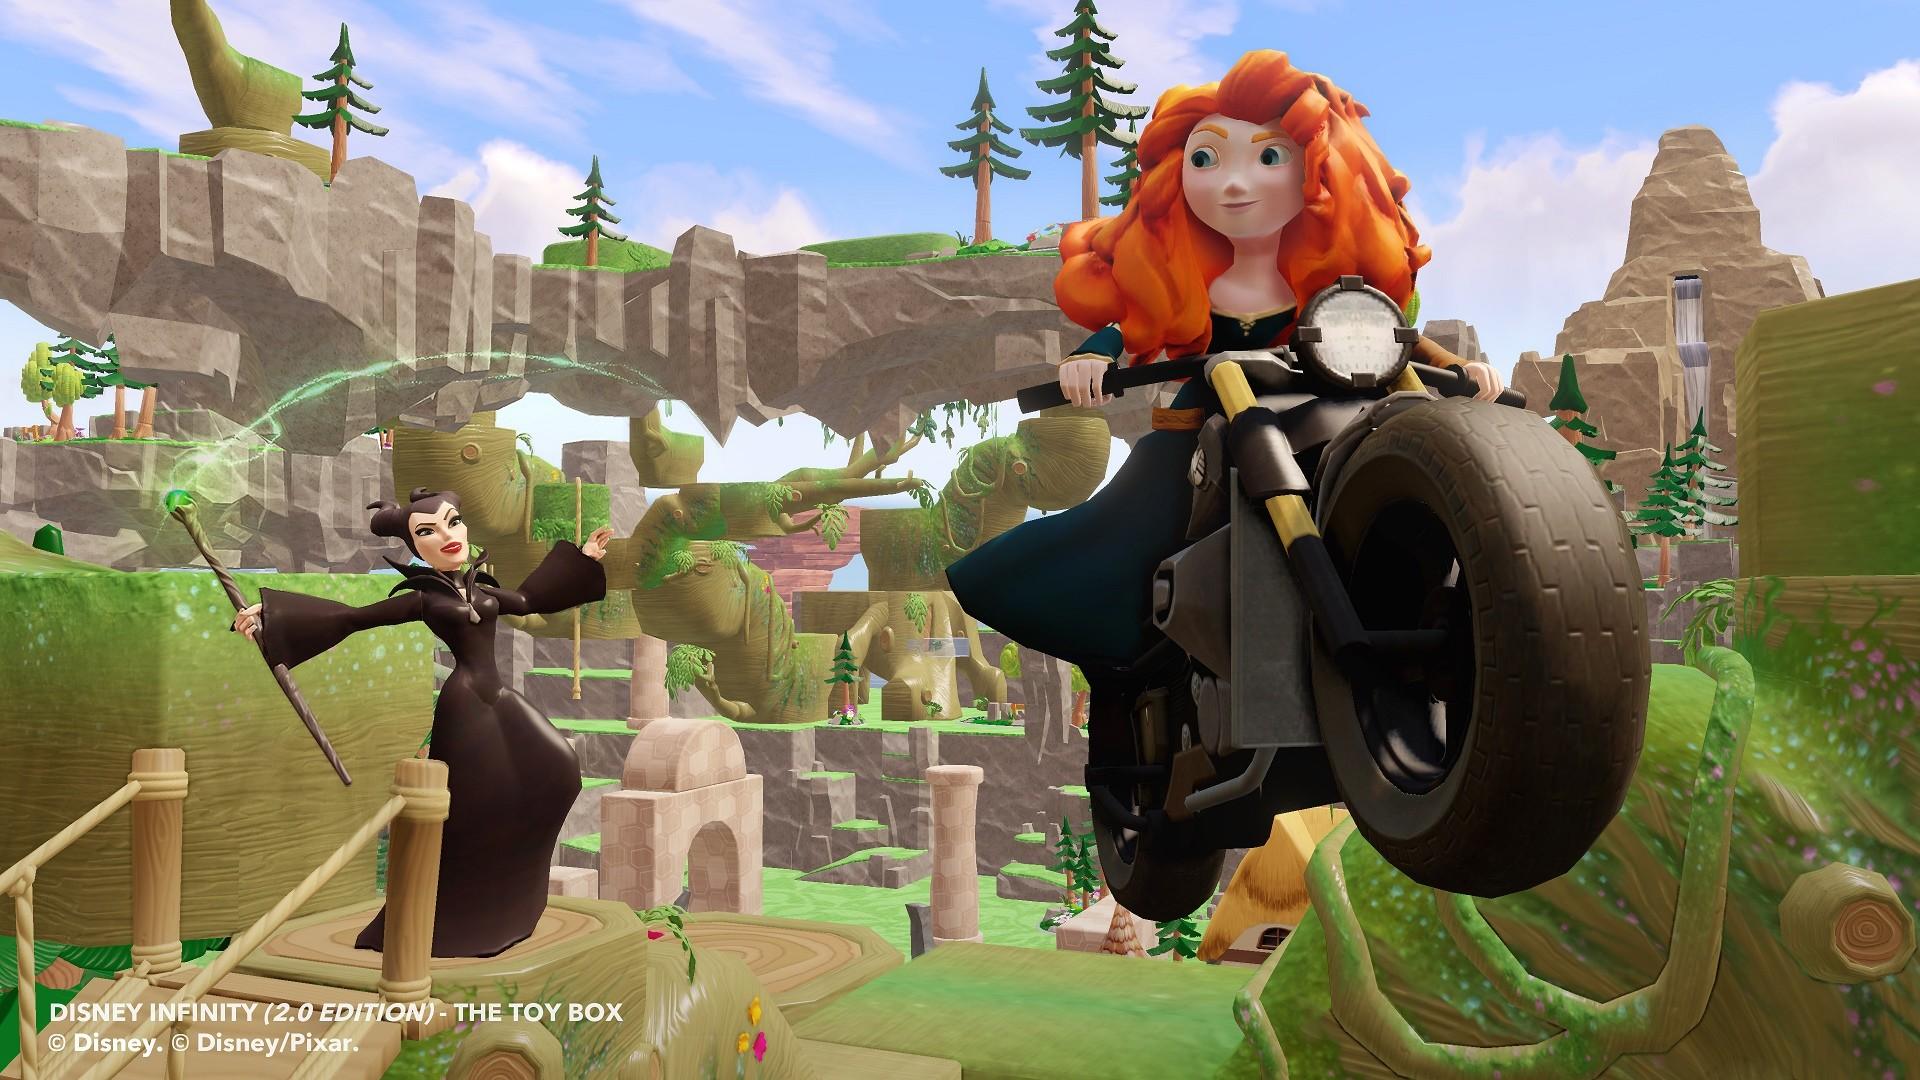 Merida et Maléfique s'invitent dans Disney Infinity 2.0